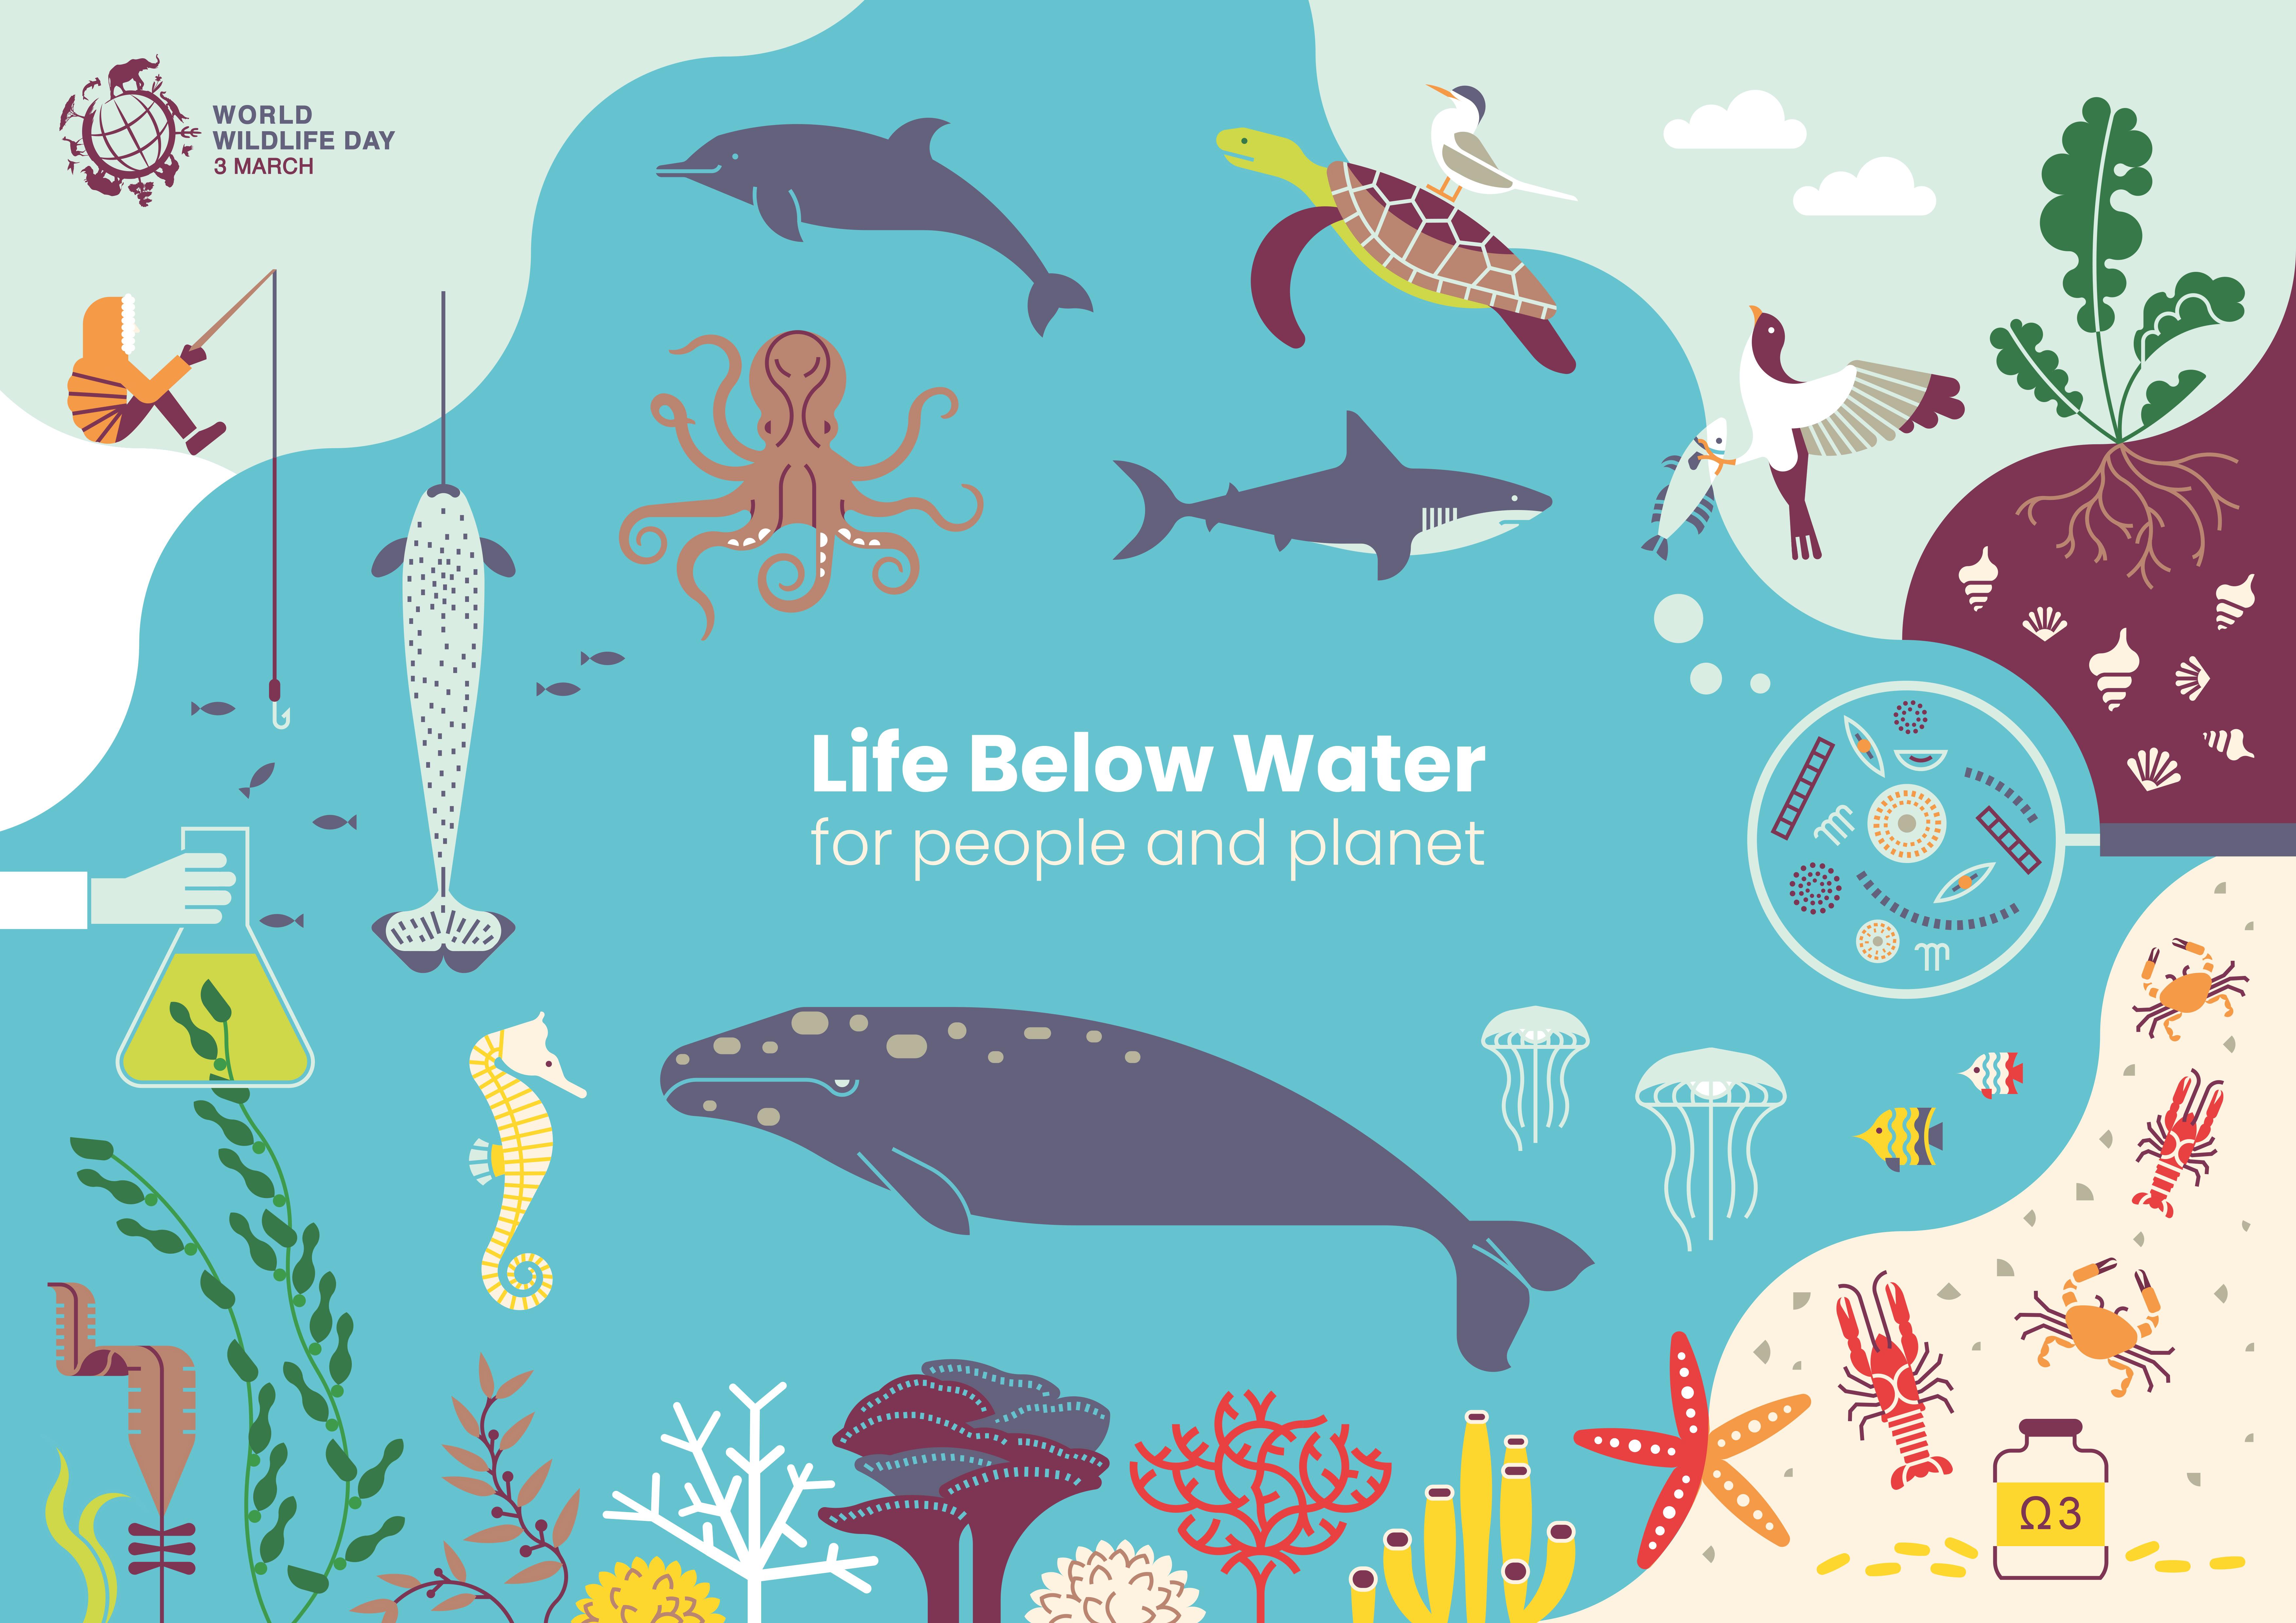 World wildlife day | life below water